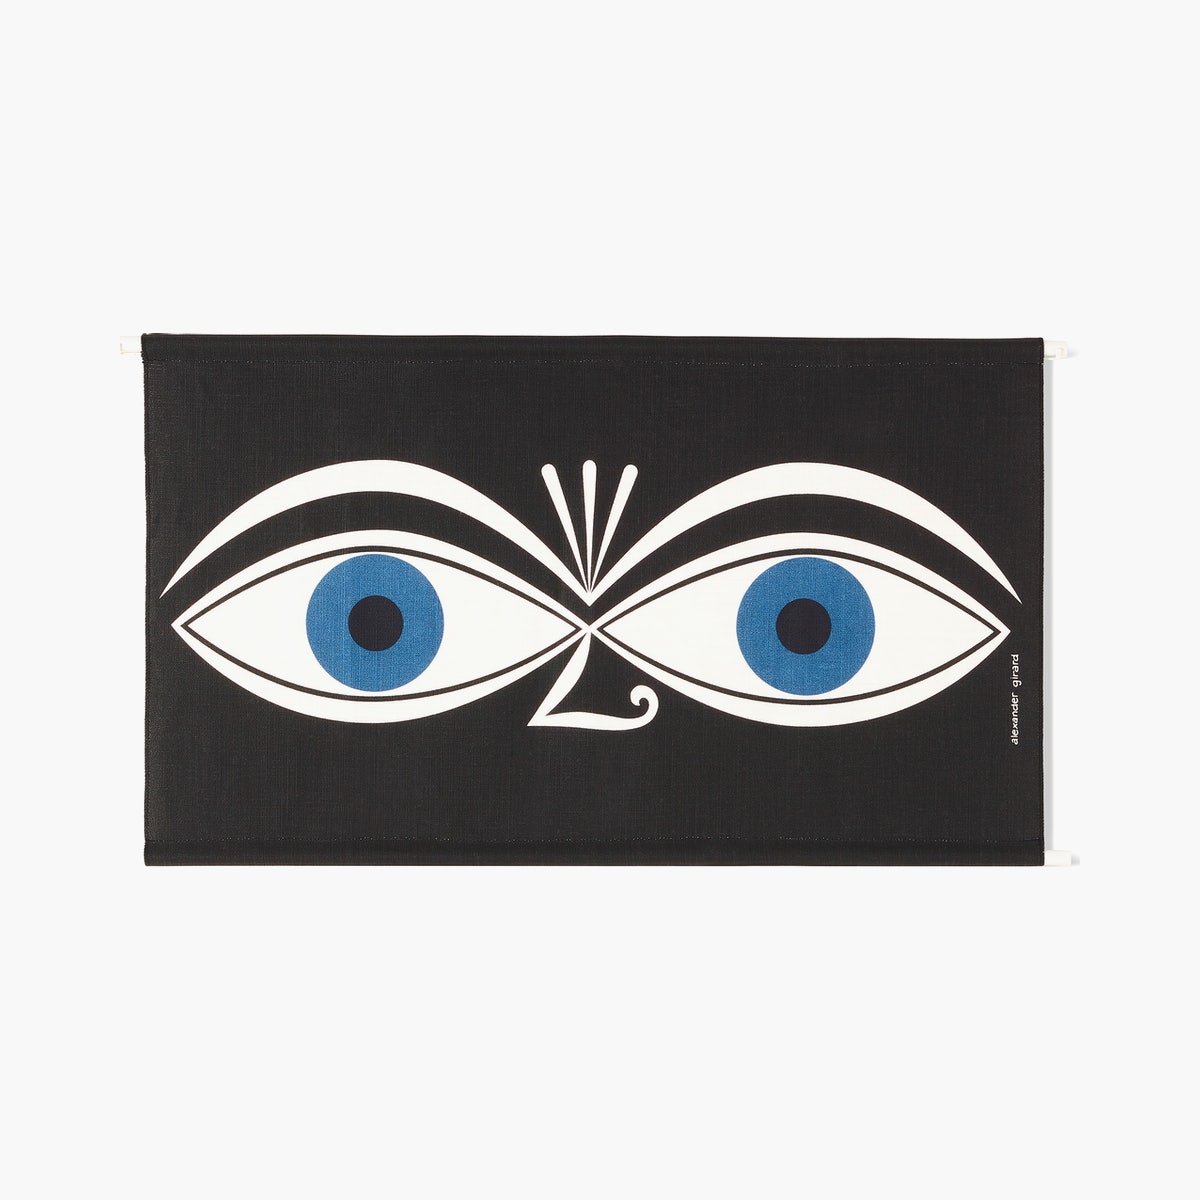 """Eyes"" by Alexander Girard"